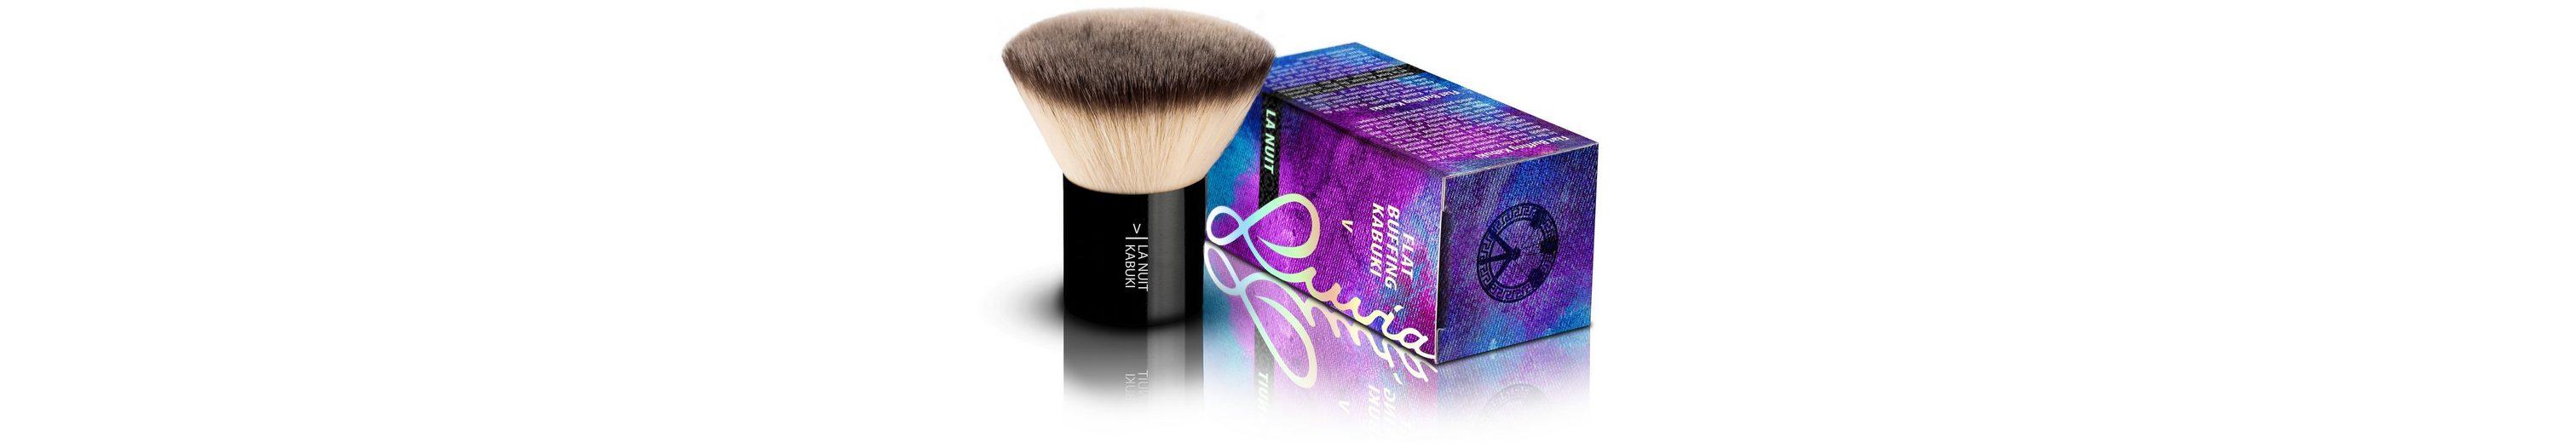 Luvia Cosmetics, »La Nuit - V Flat Buffing Kabuki«, Veganer und dichter Kabuki Kosmetikpinsel